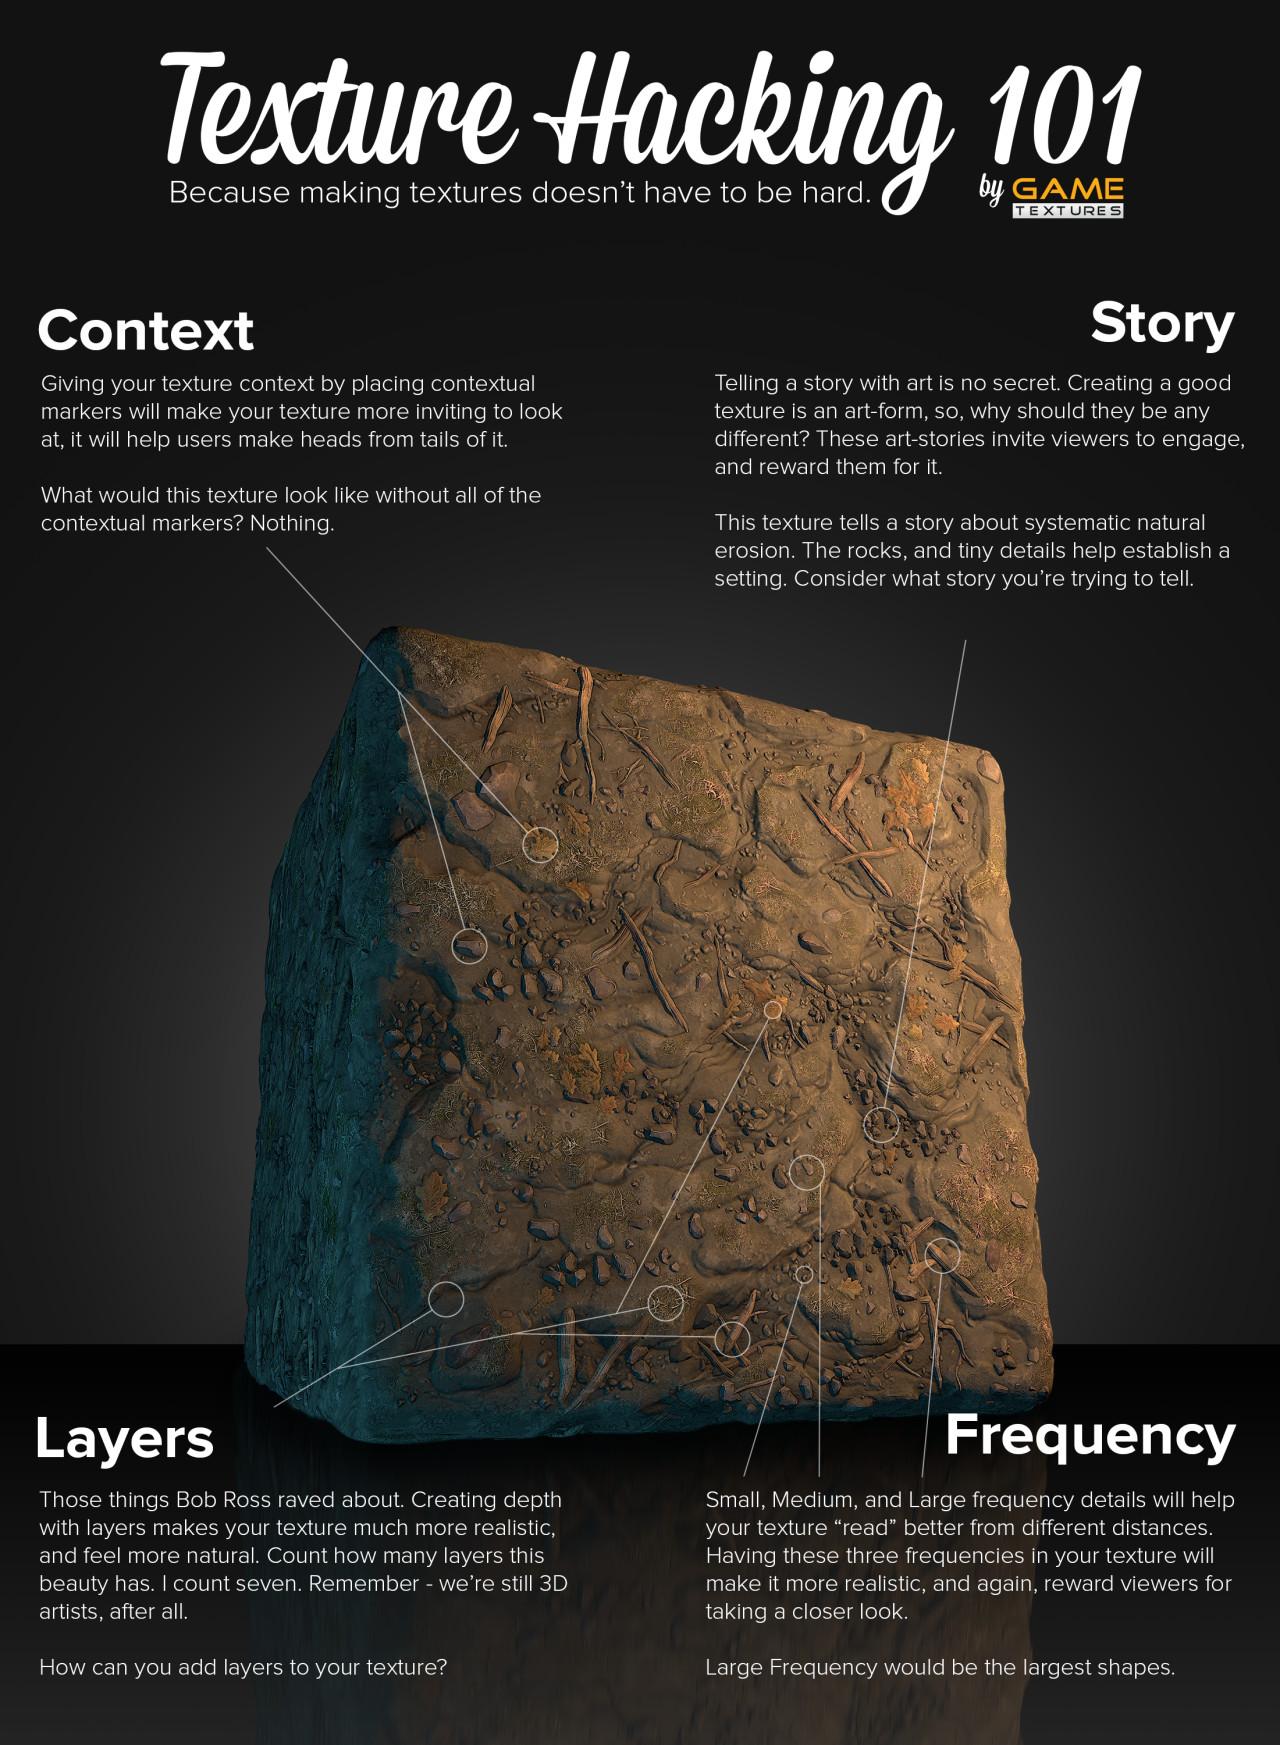 Tanner Kalstrom - Texture Hacking 101